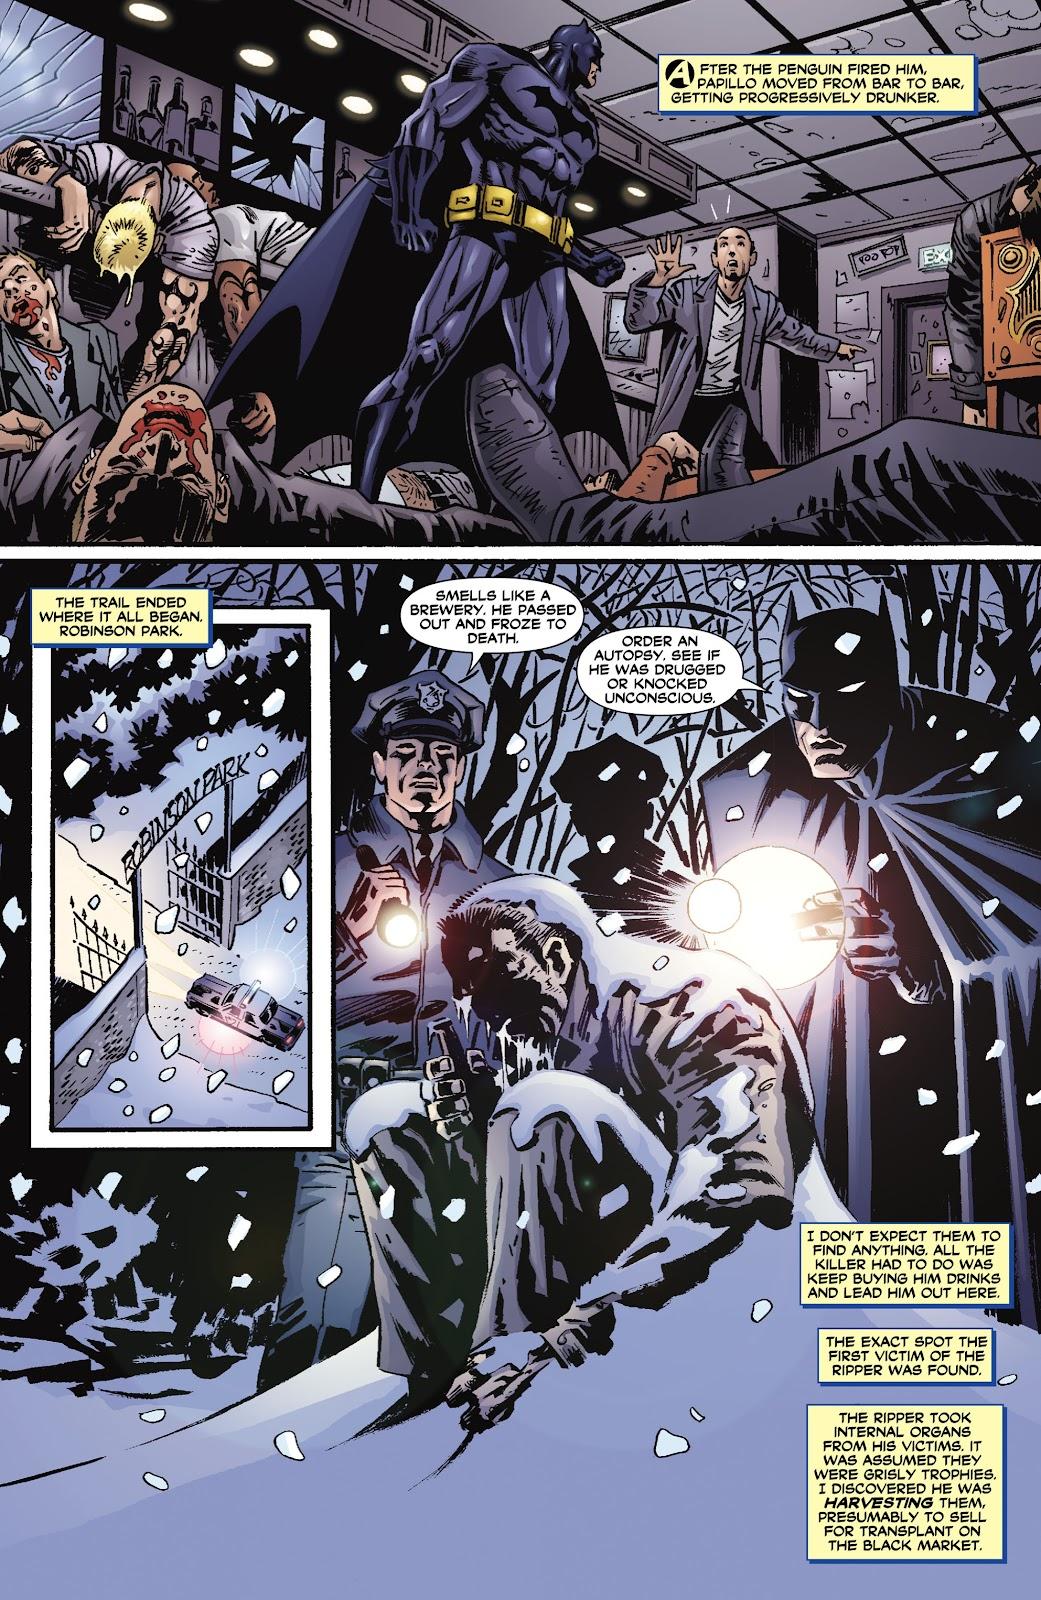 Read Batman: Gotham Knights #46 PDF ~ Library Download And